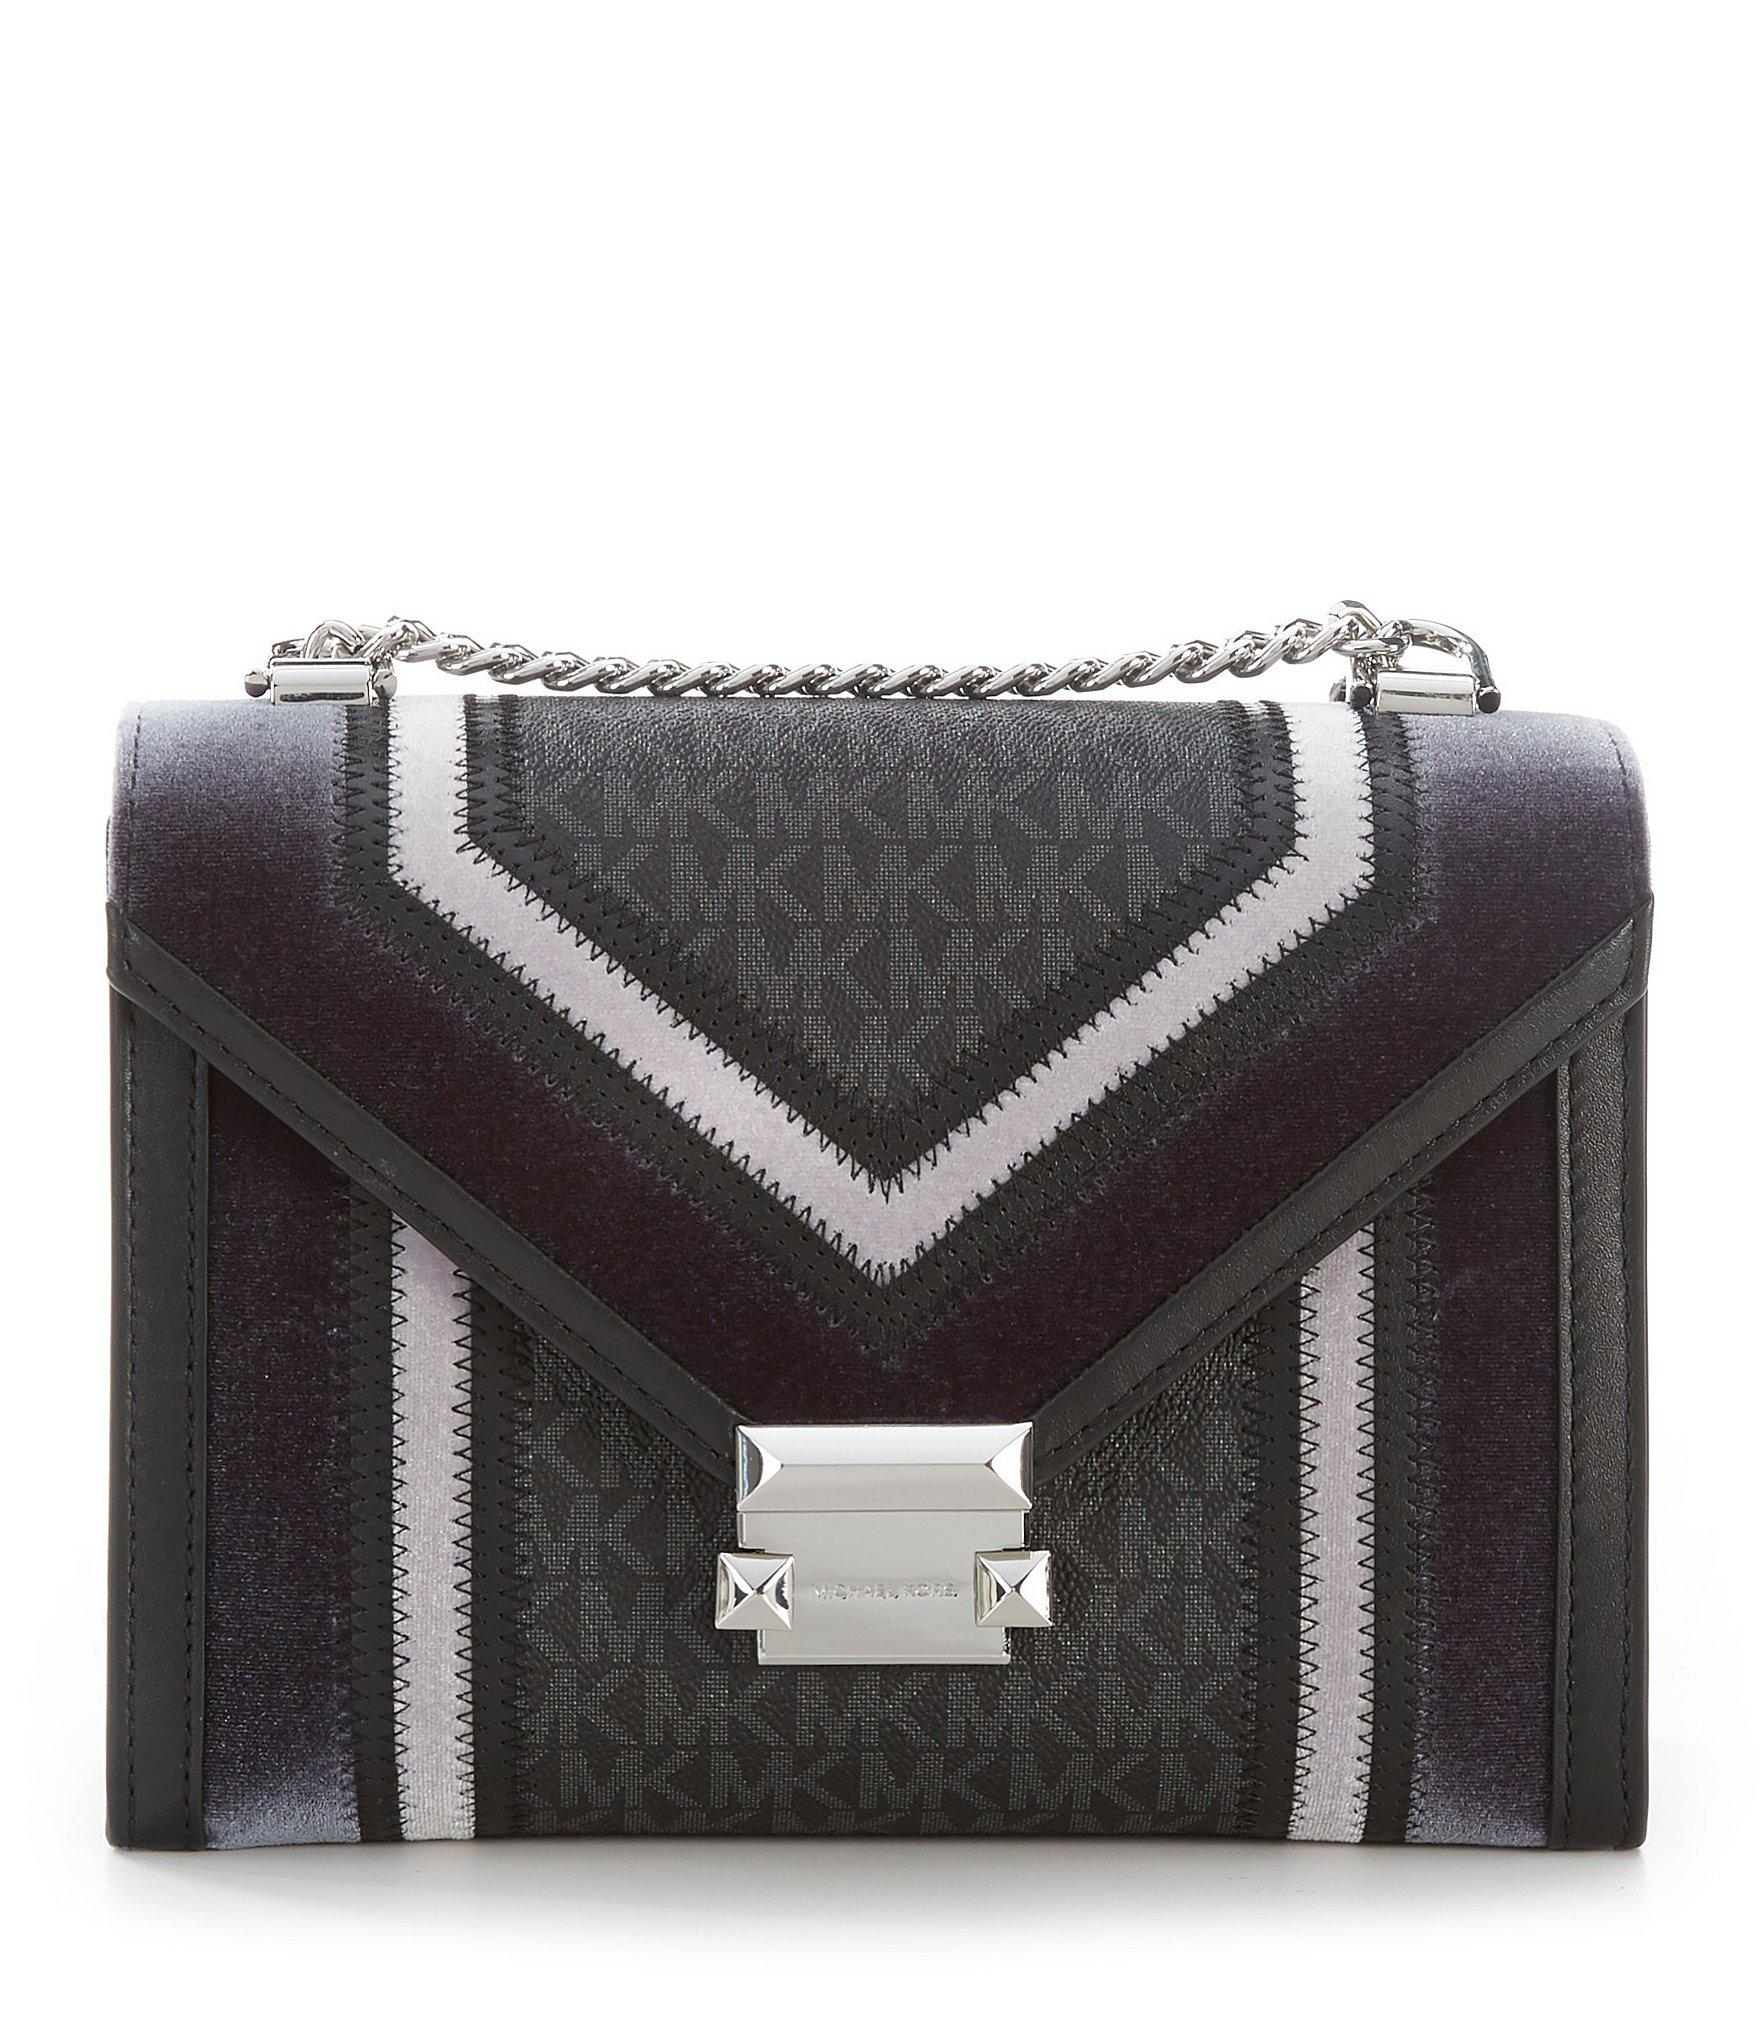 117dc55ec680 MICHAEL Michael Kors Whitney Signature Colorblock Shoulder Bag in ...